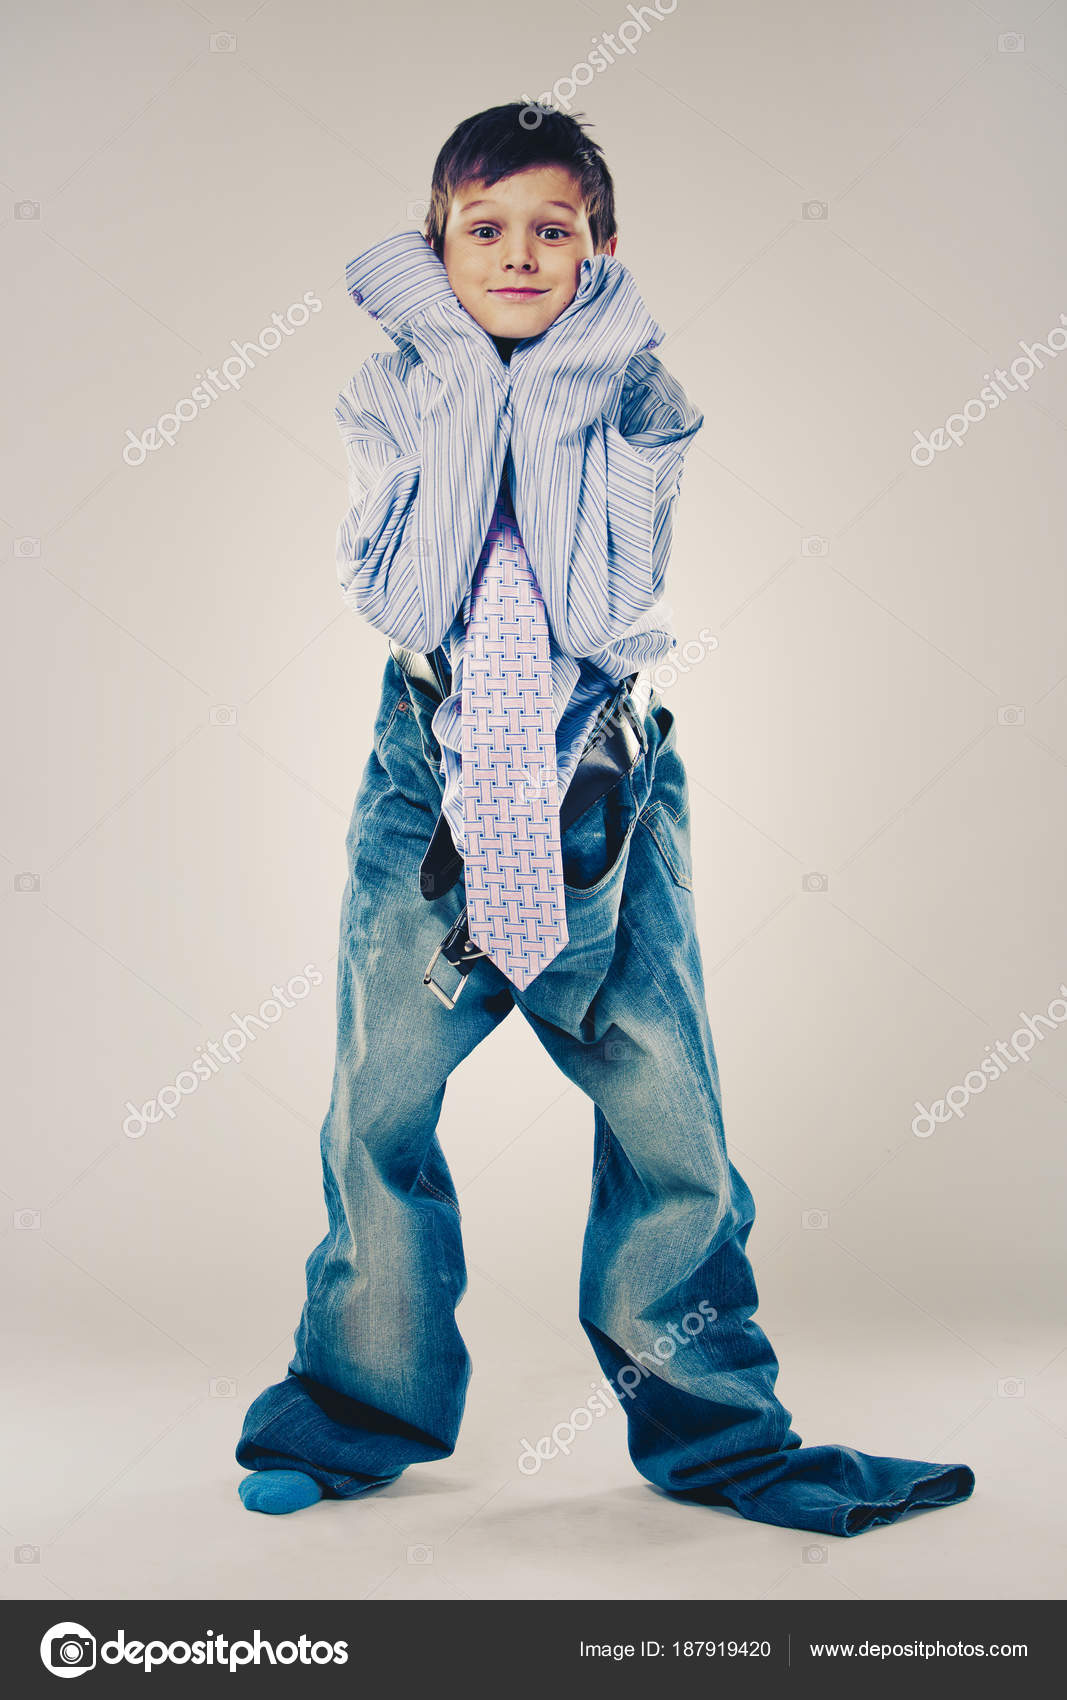 Cảm Cười...chơi - Page 40 Depositphotos_187919420-stock-photo-funny-boy-wearing-dads-clothes